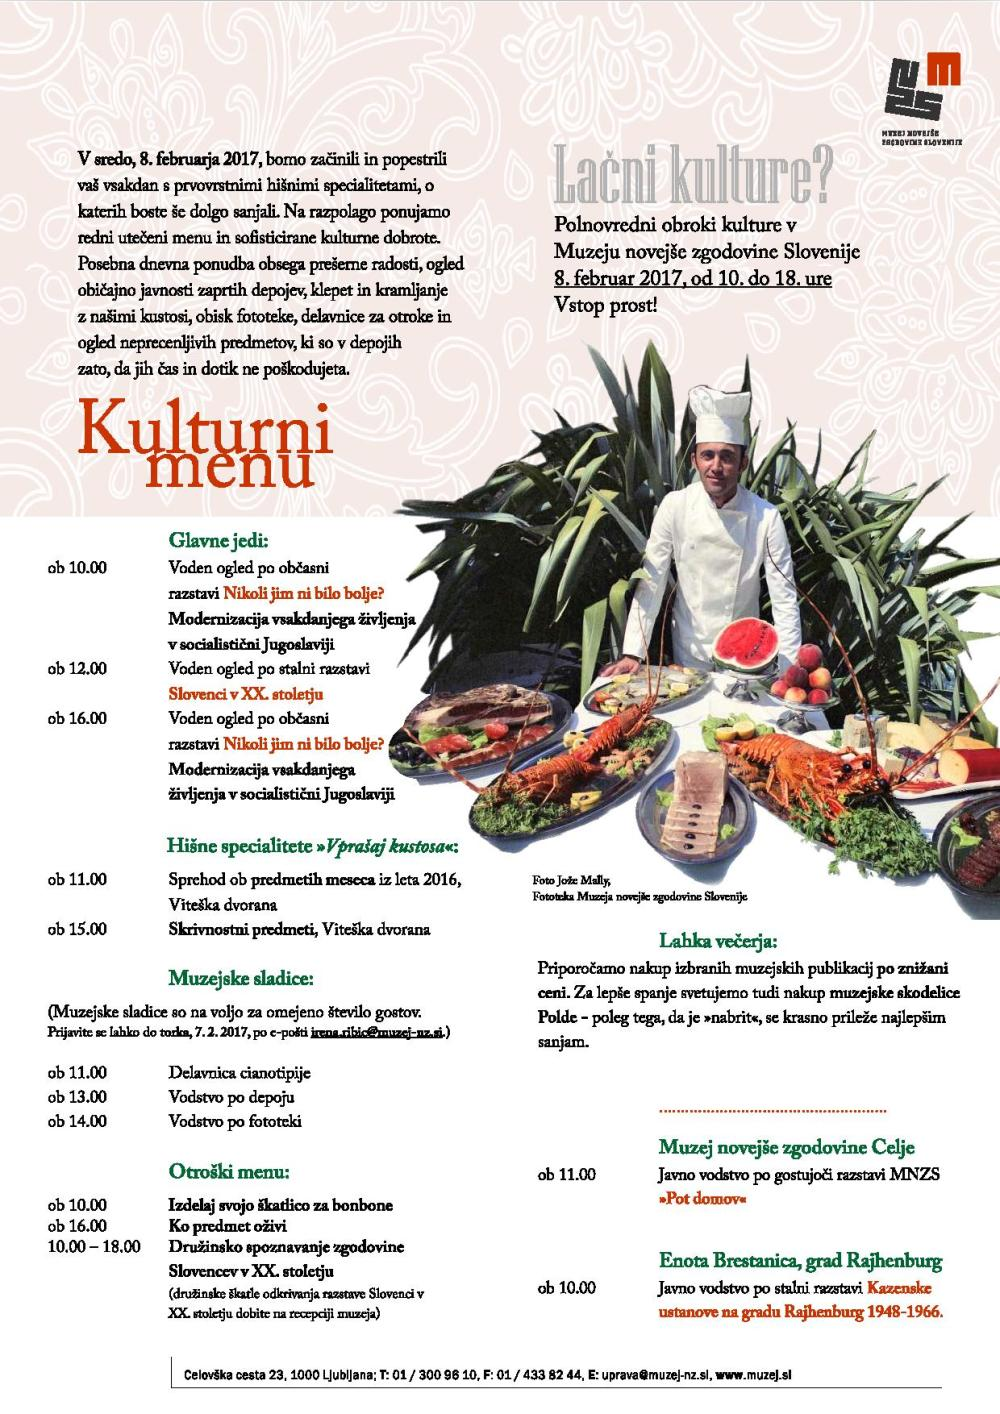 e-vabilo-kulturni-praznik-page-001